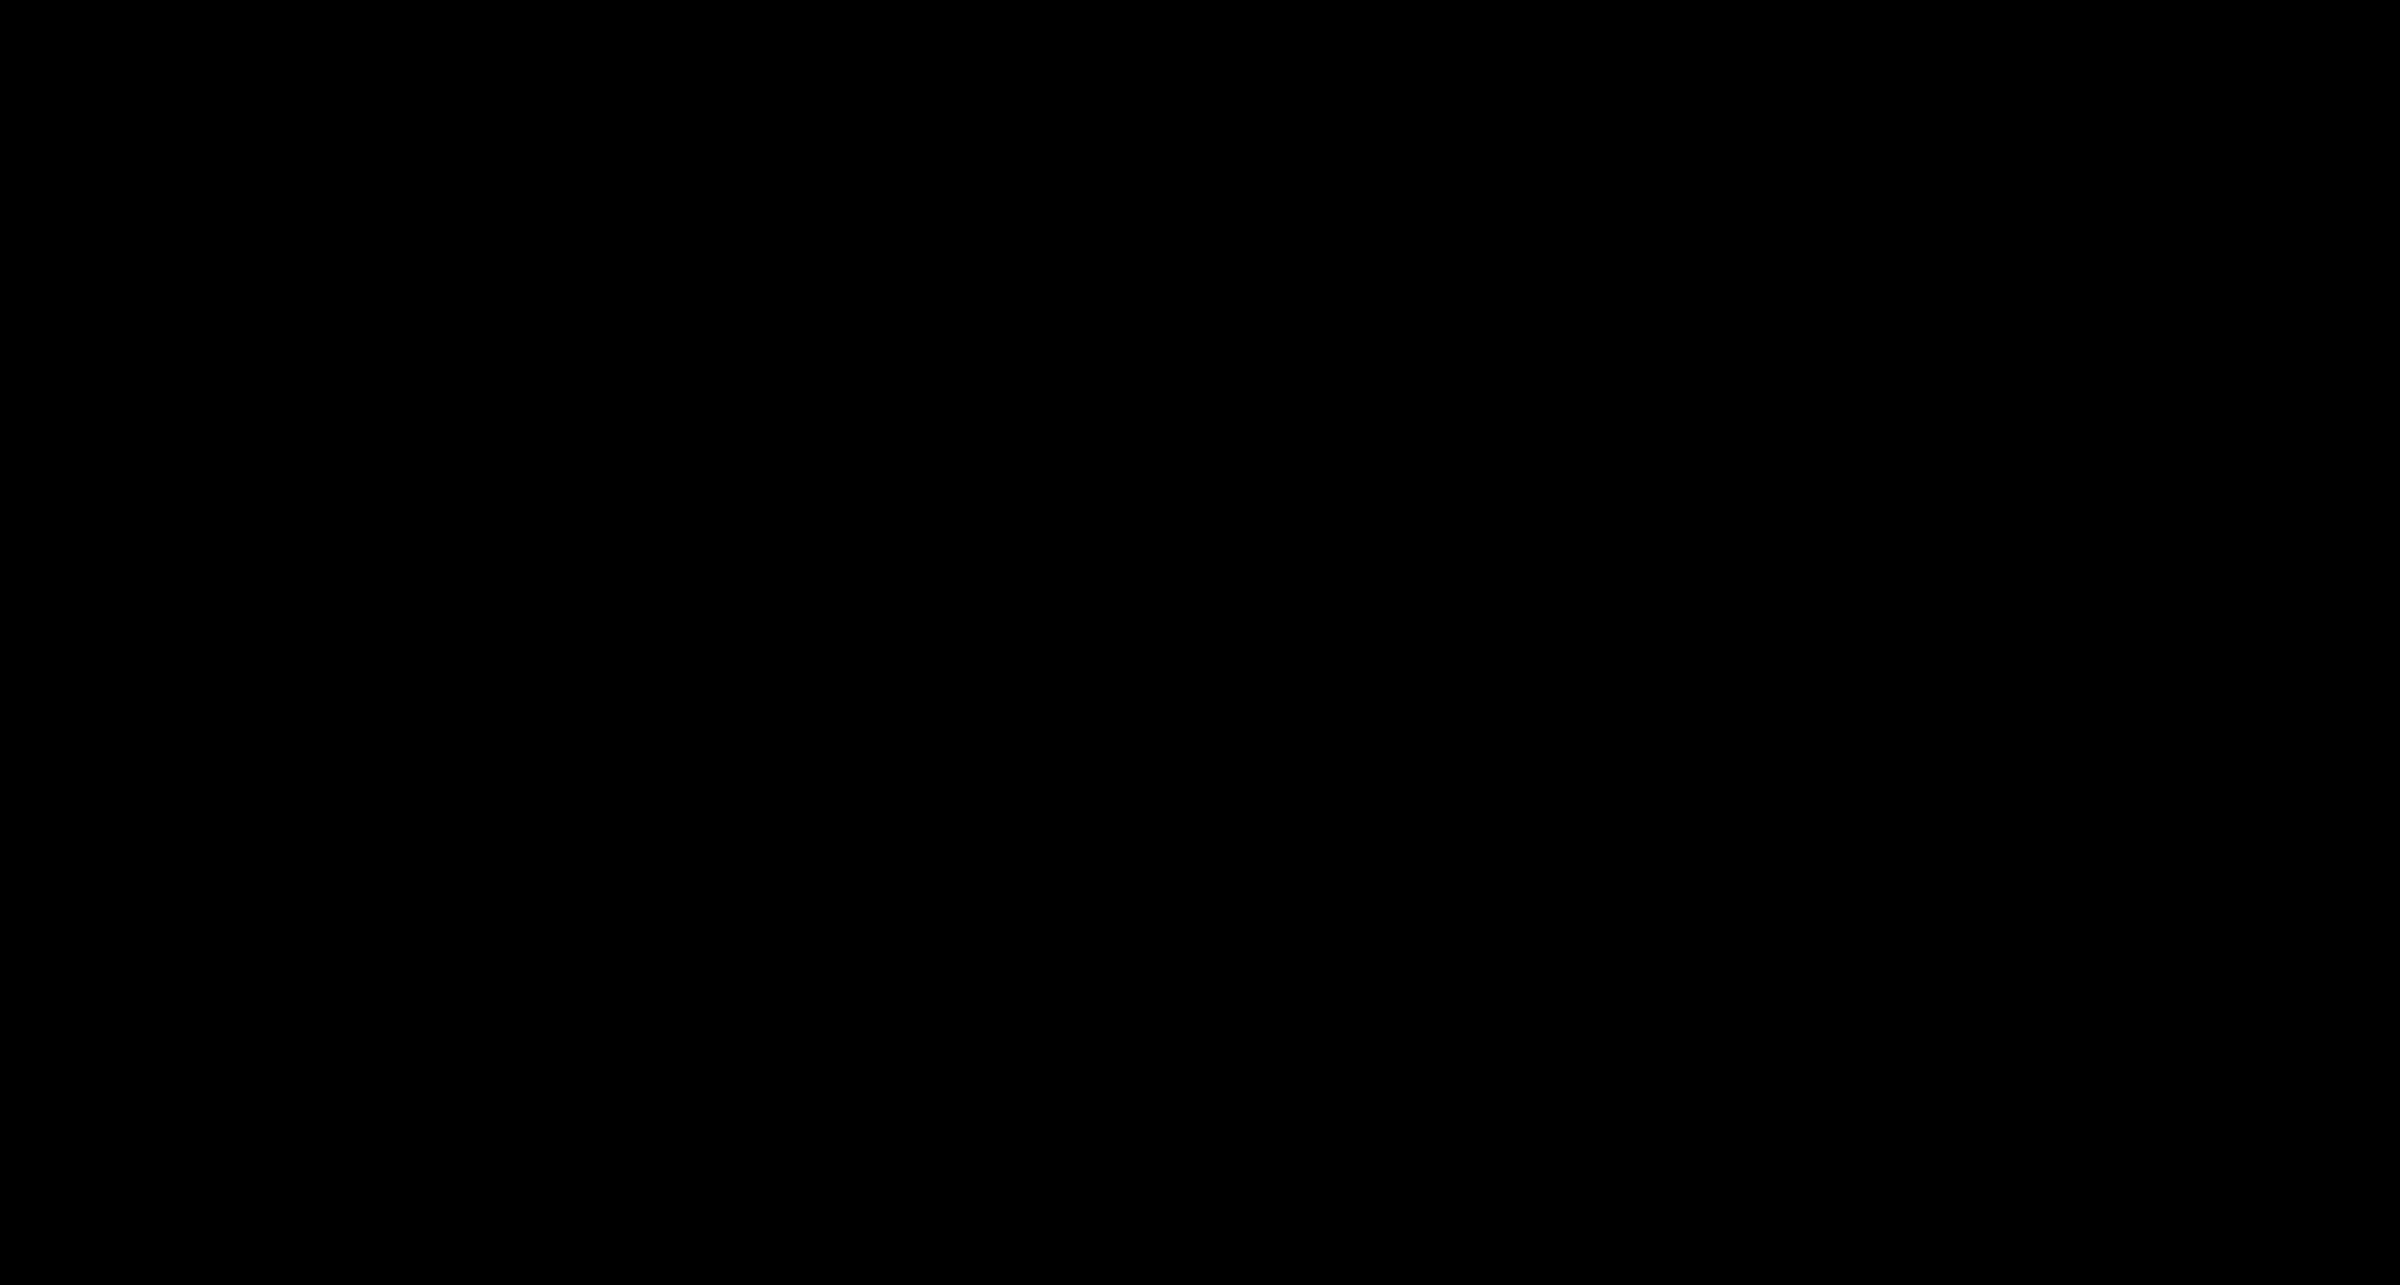 2400x1285 Clipart